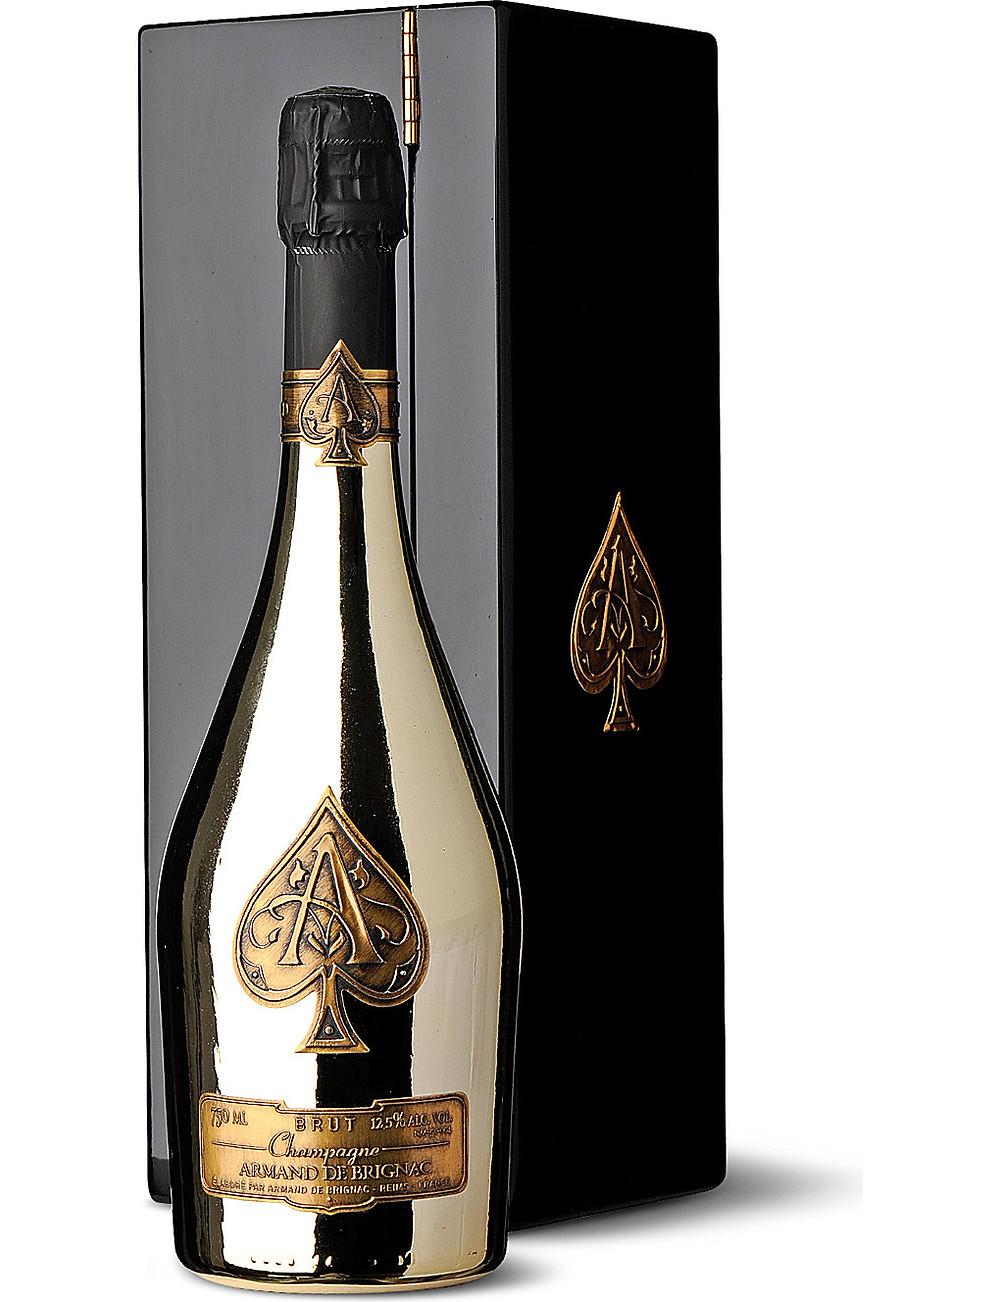 Ace of Spades Armand de Brignac Champagne